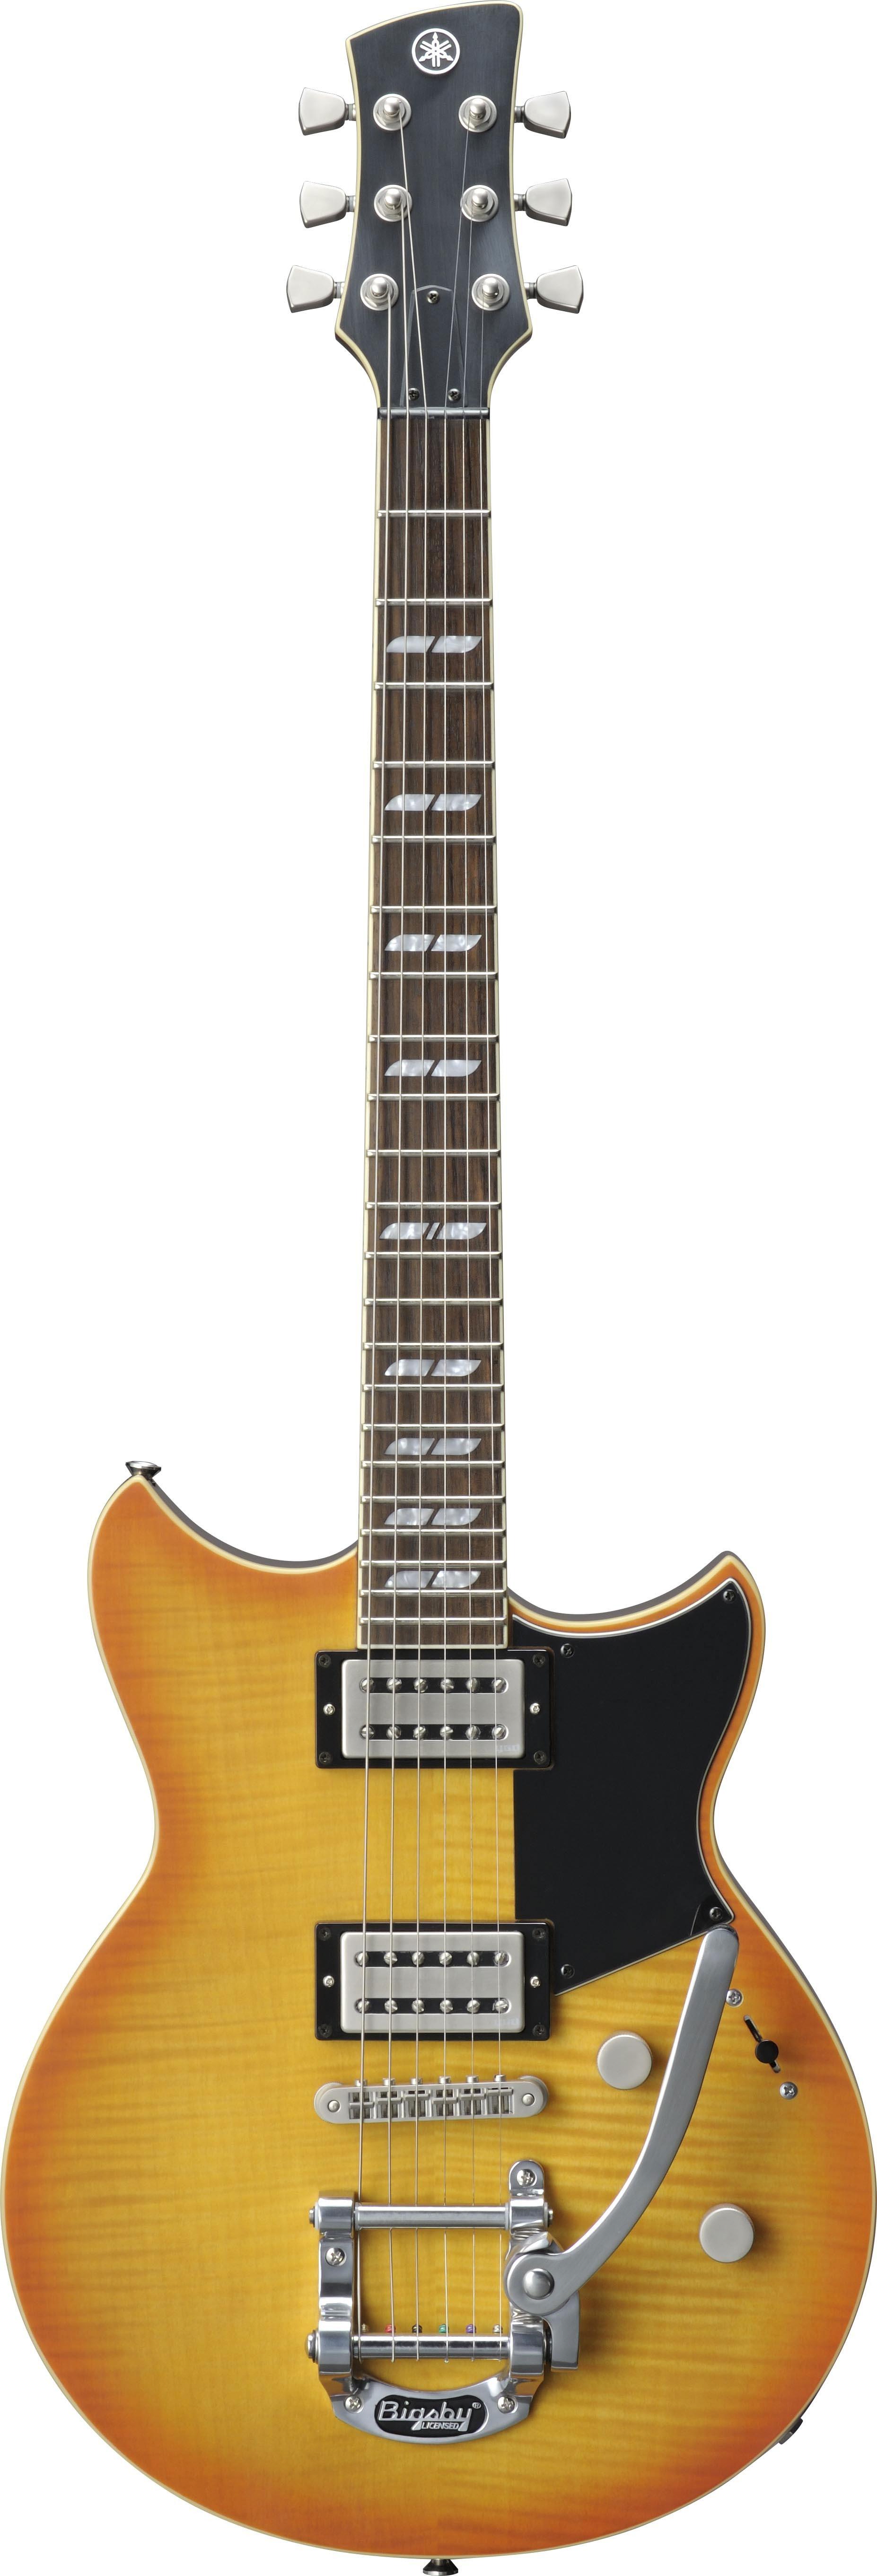 product review yamaha revstar rs720b electric guitar guitar girl magazine. Black Bedroom Furniture Sets. Home Design Ideas